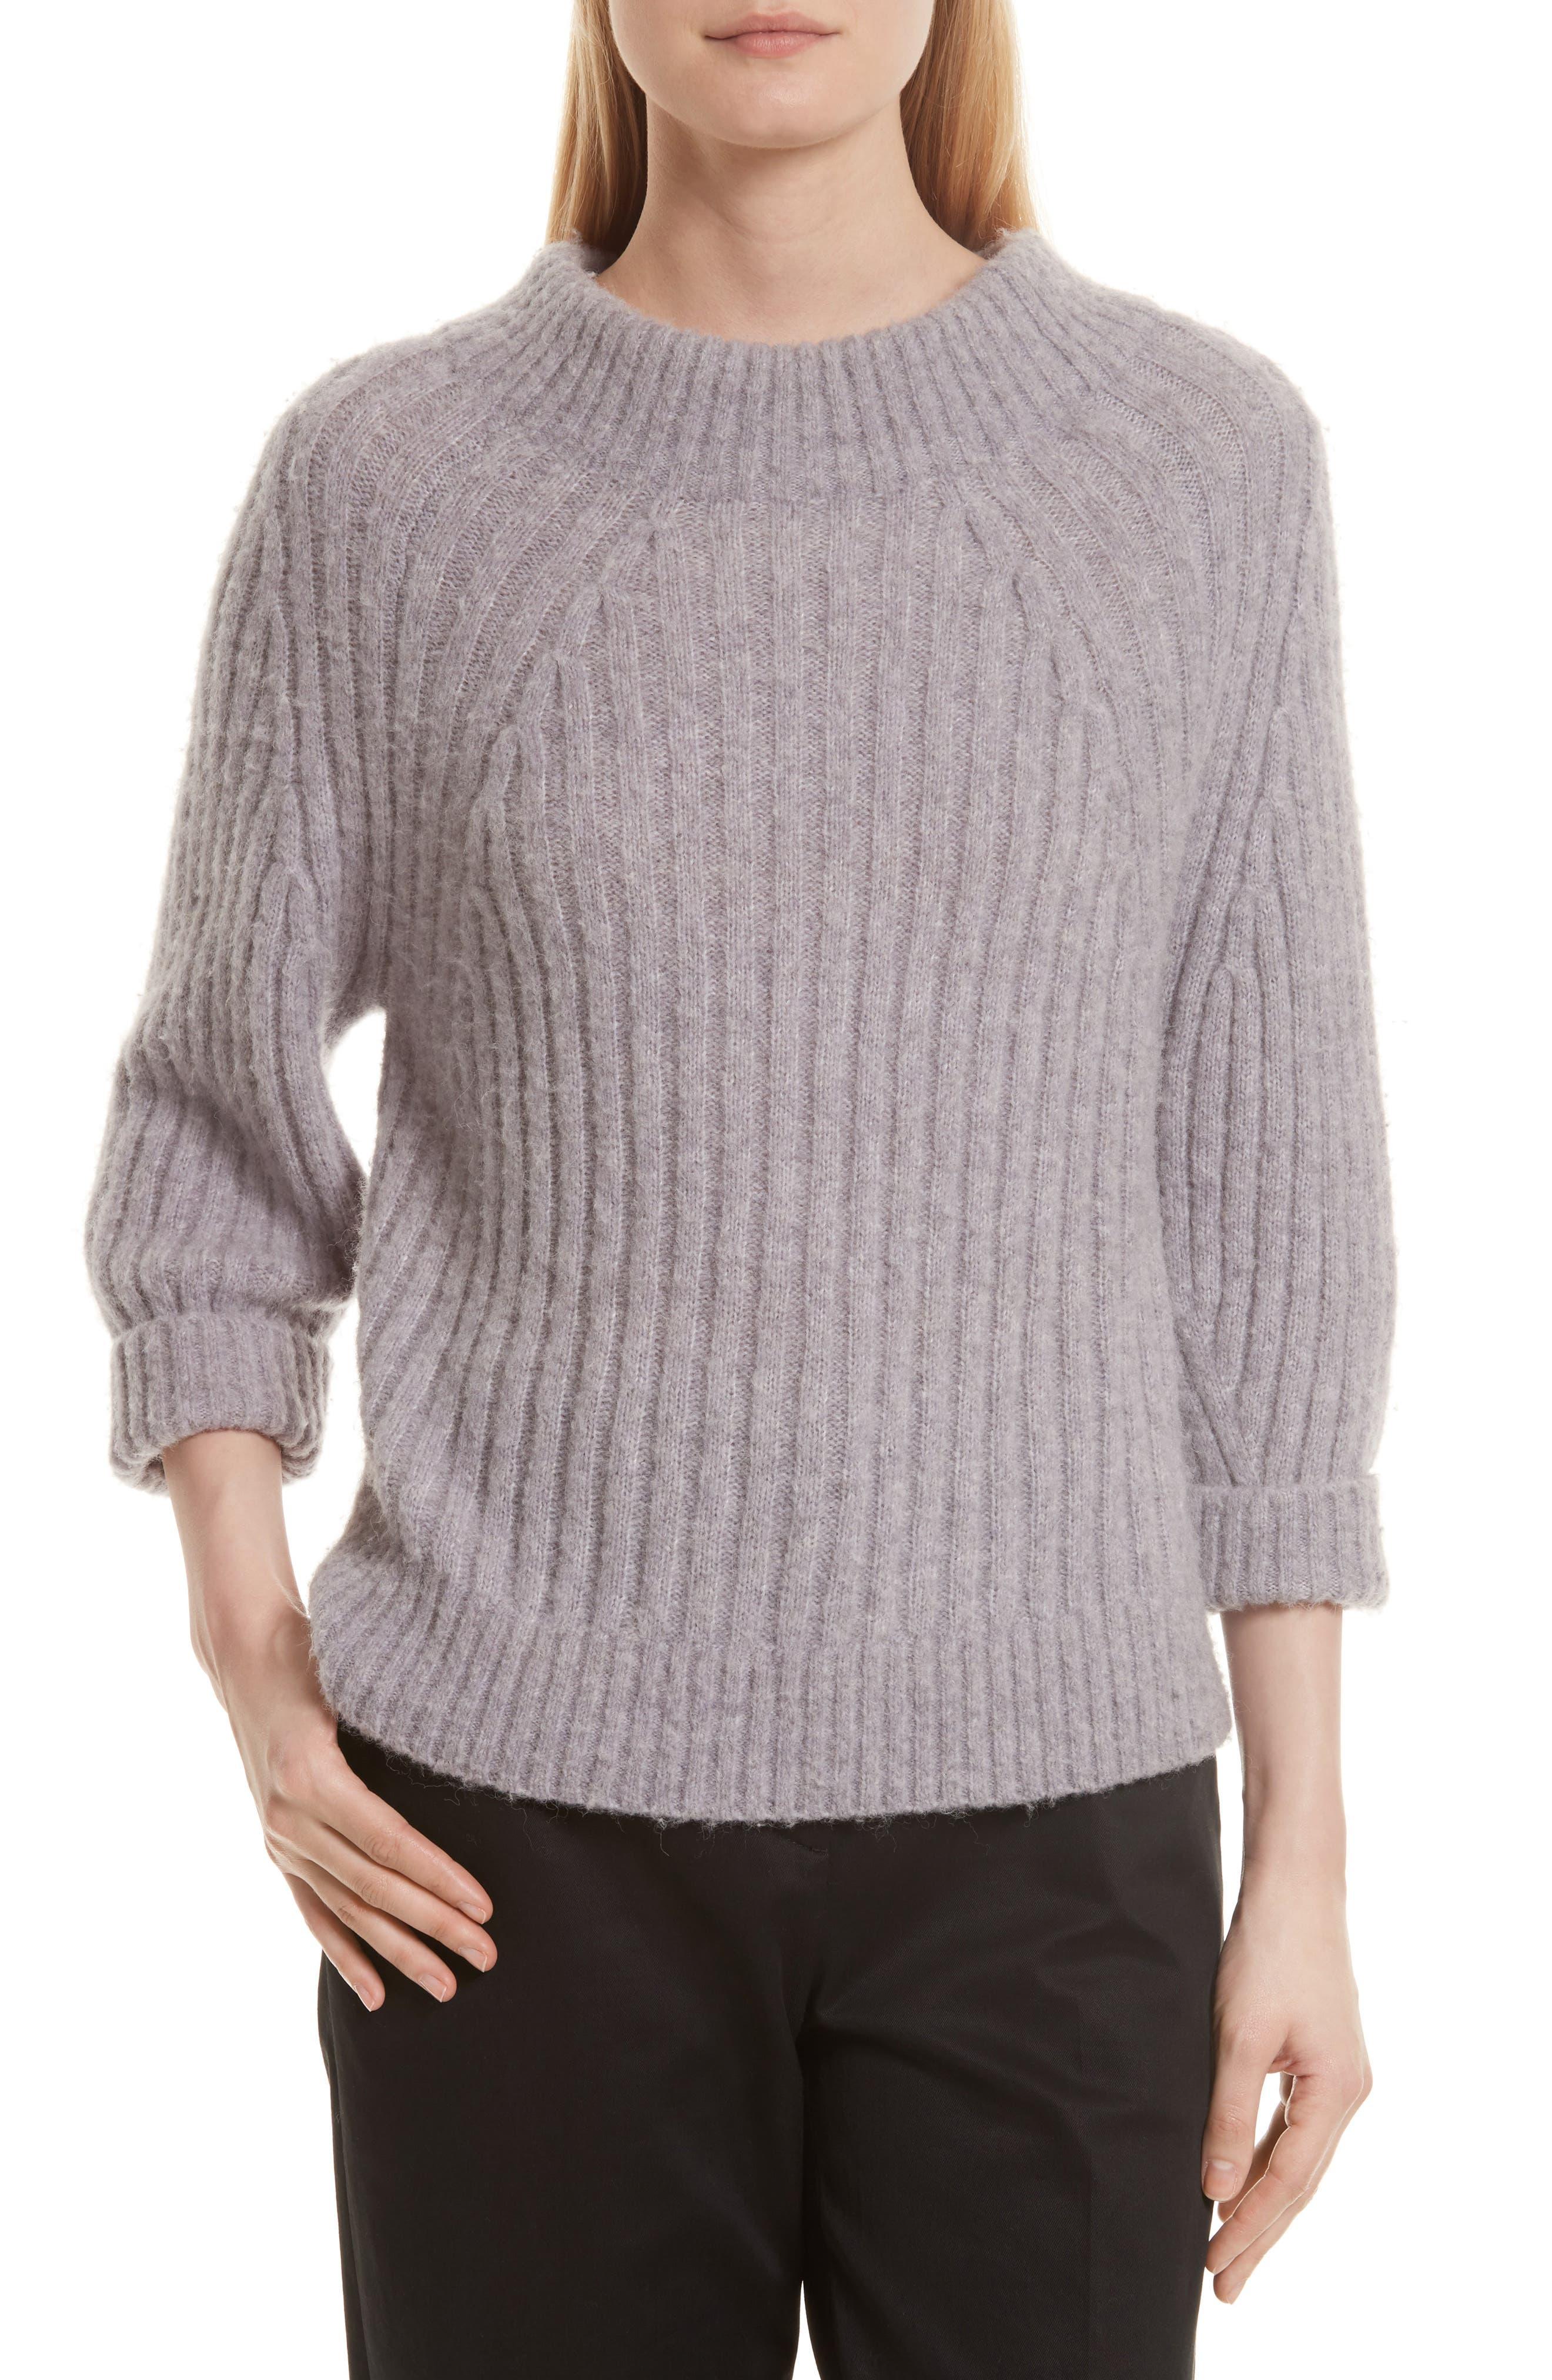 Alternate Image 1 Selected - 3.1 Phillip Lim Rib Knit Sweater